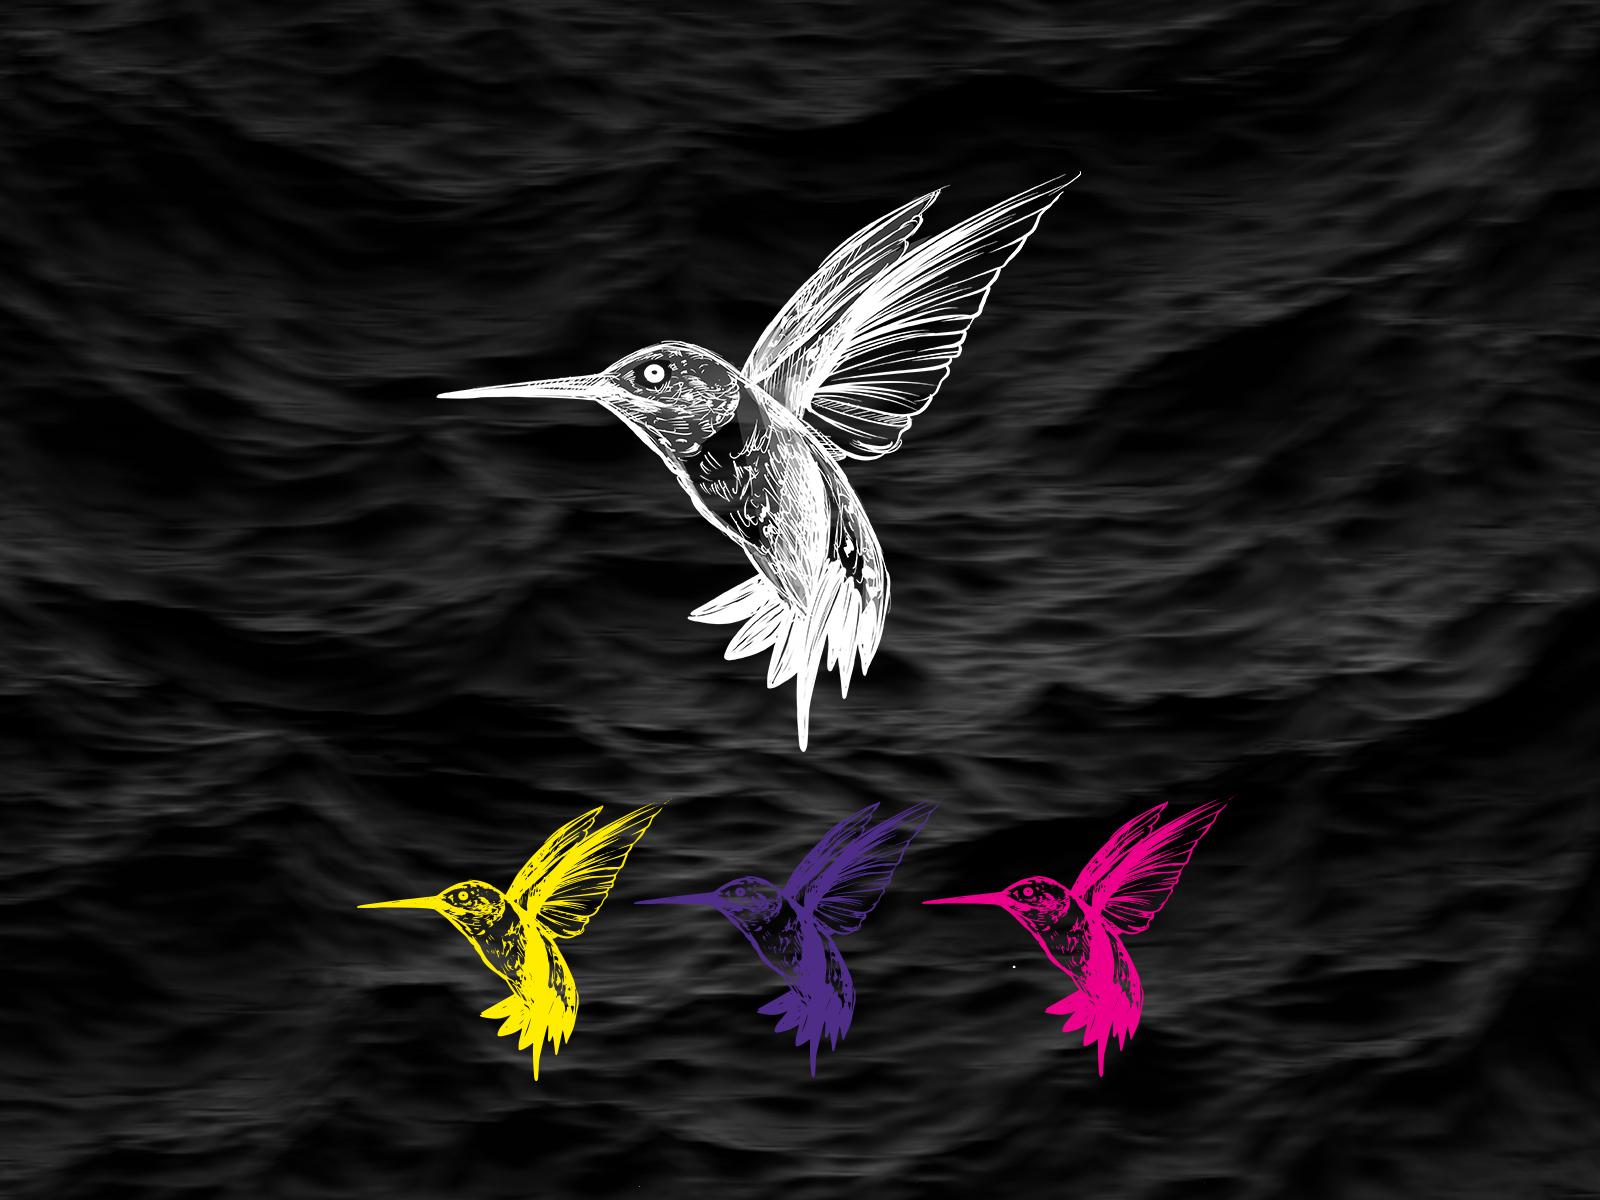 hummingbird colibri szín variációk.jpg